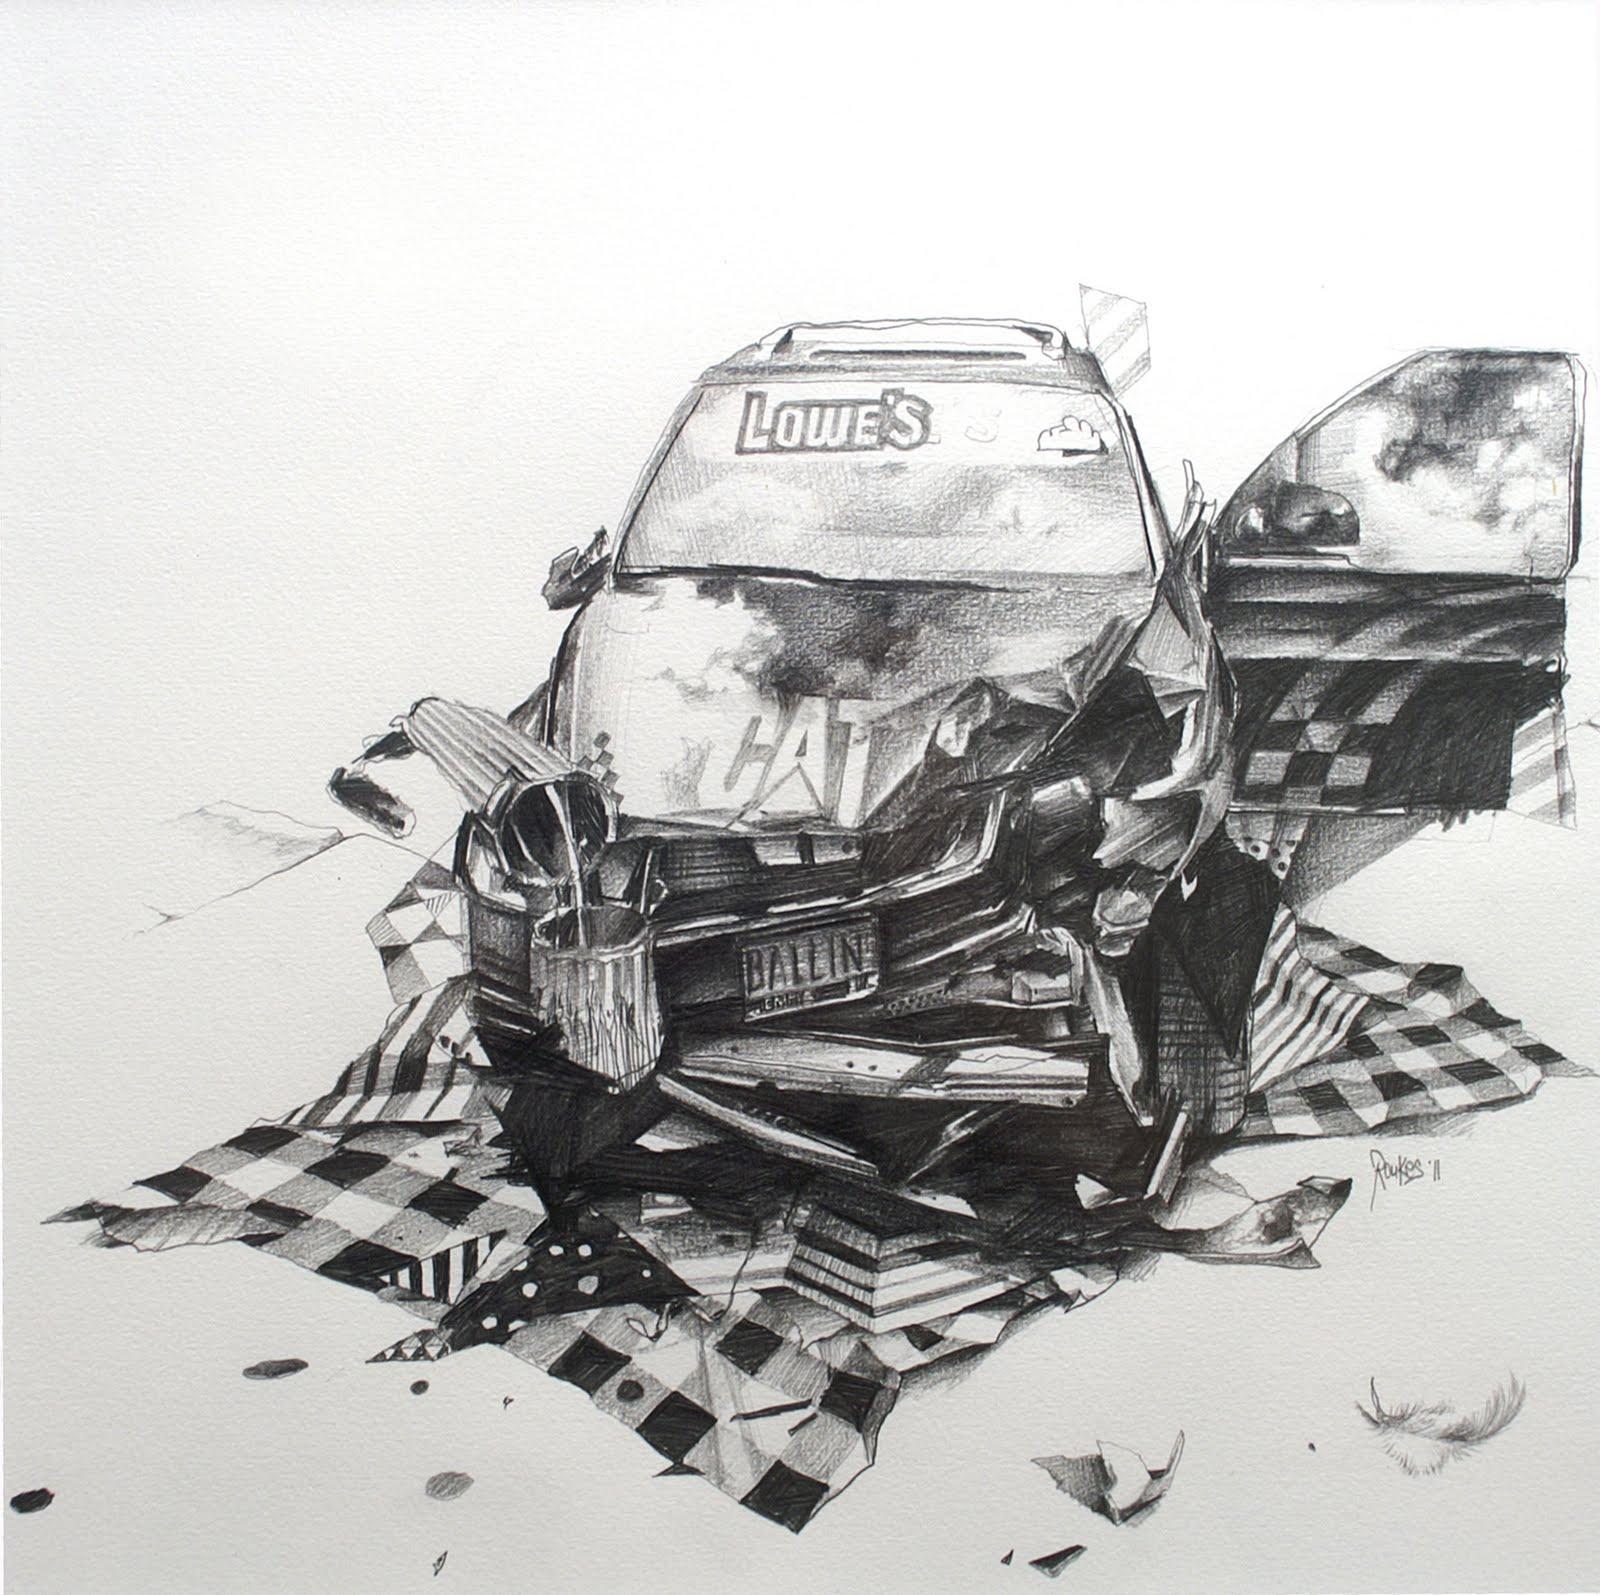 Joram Roukes: drawings